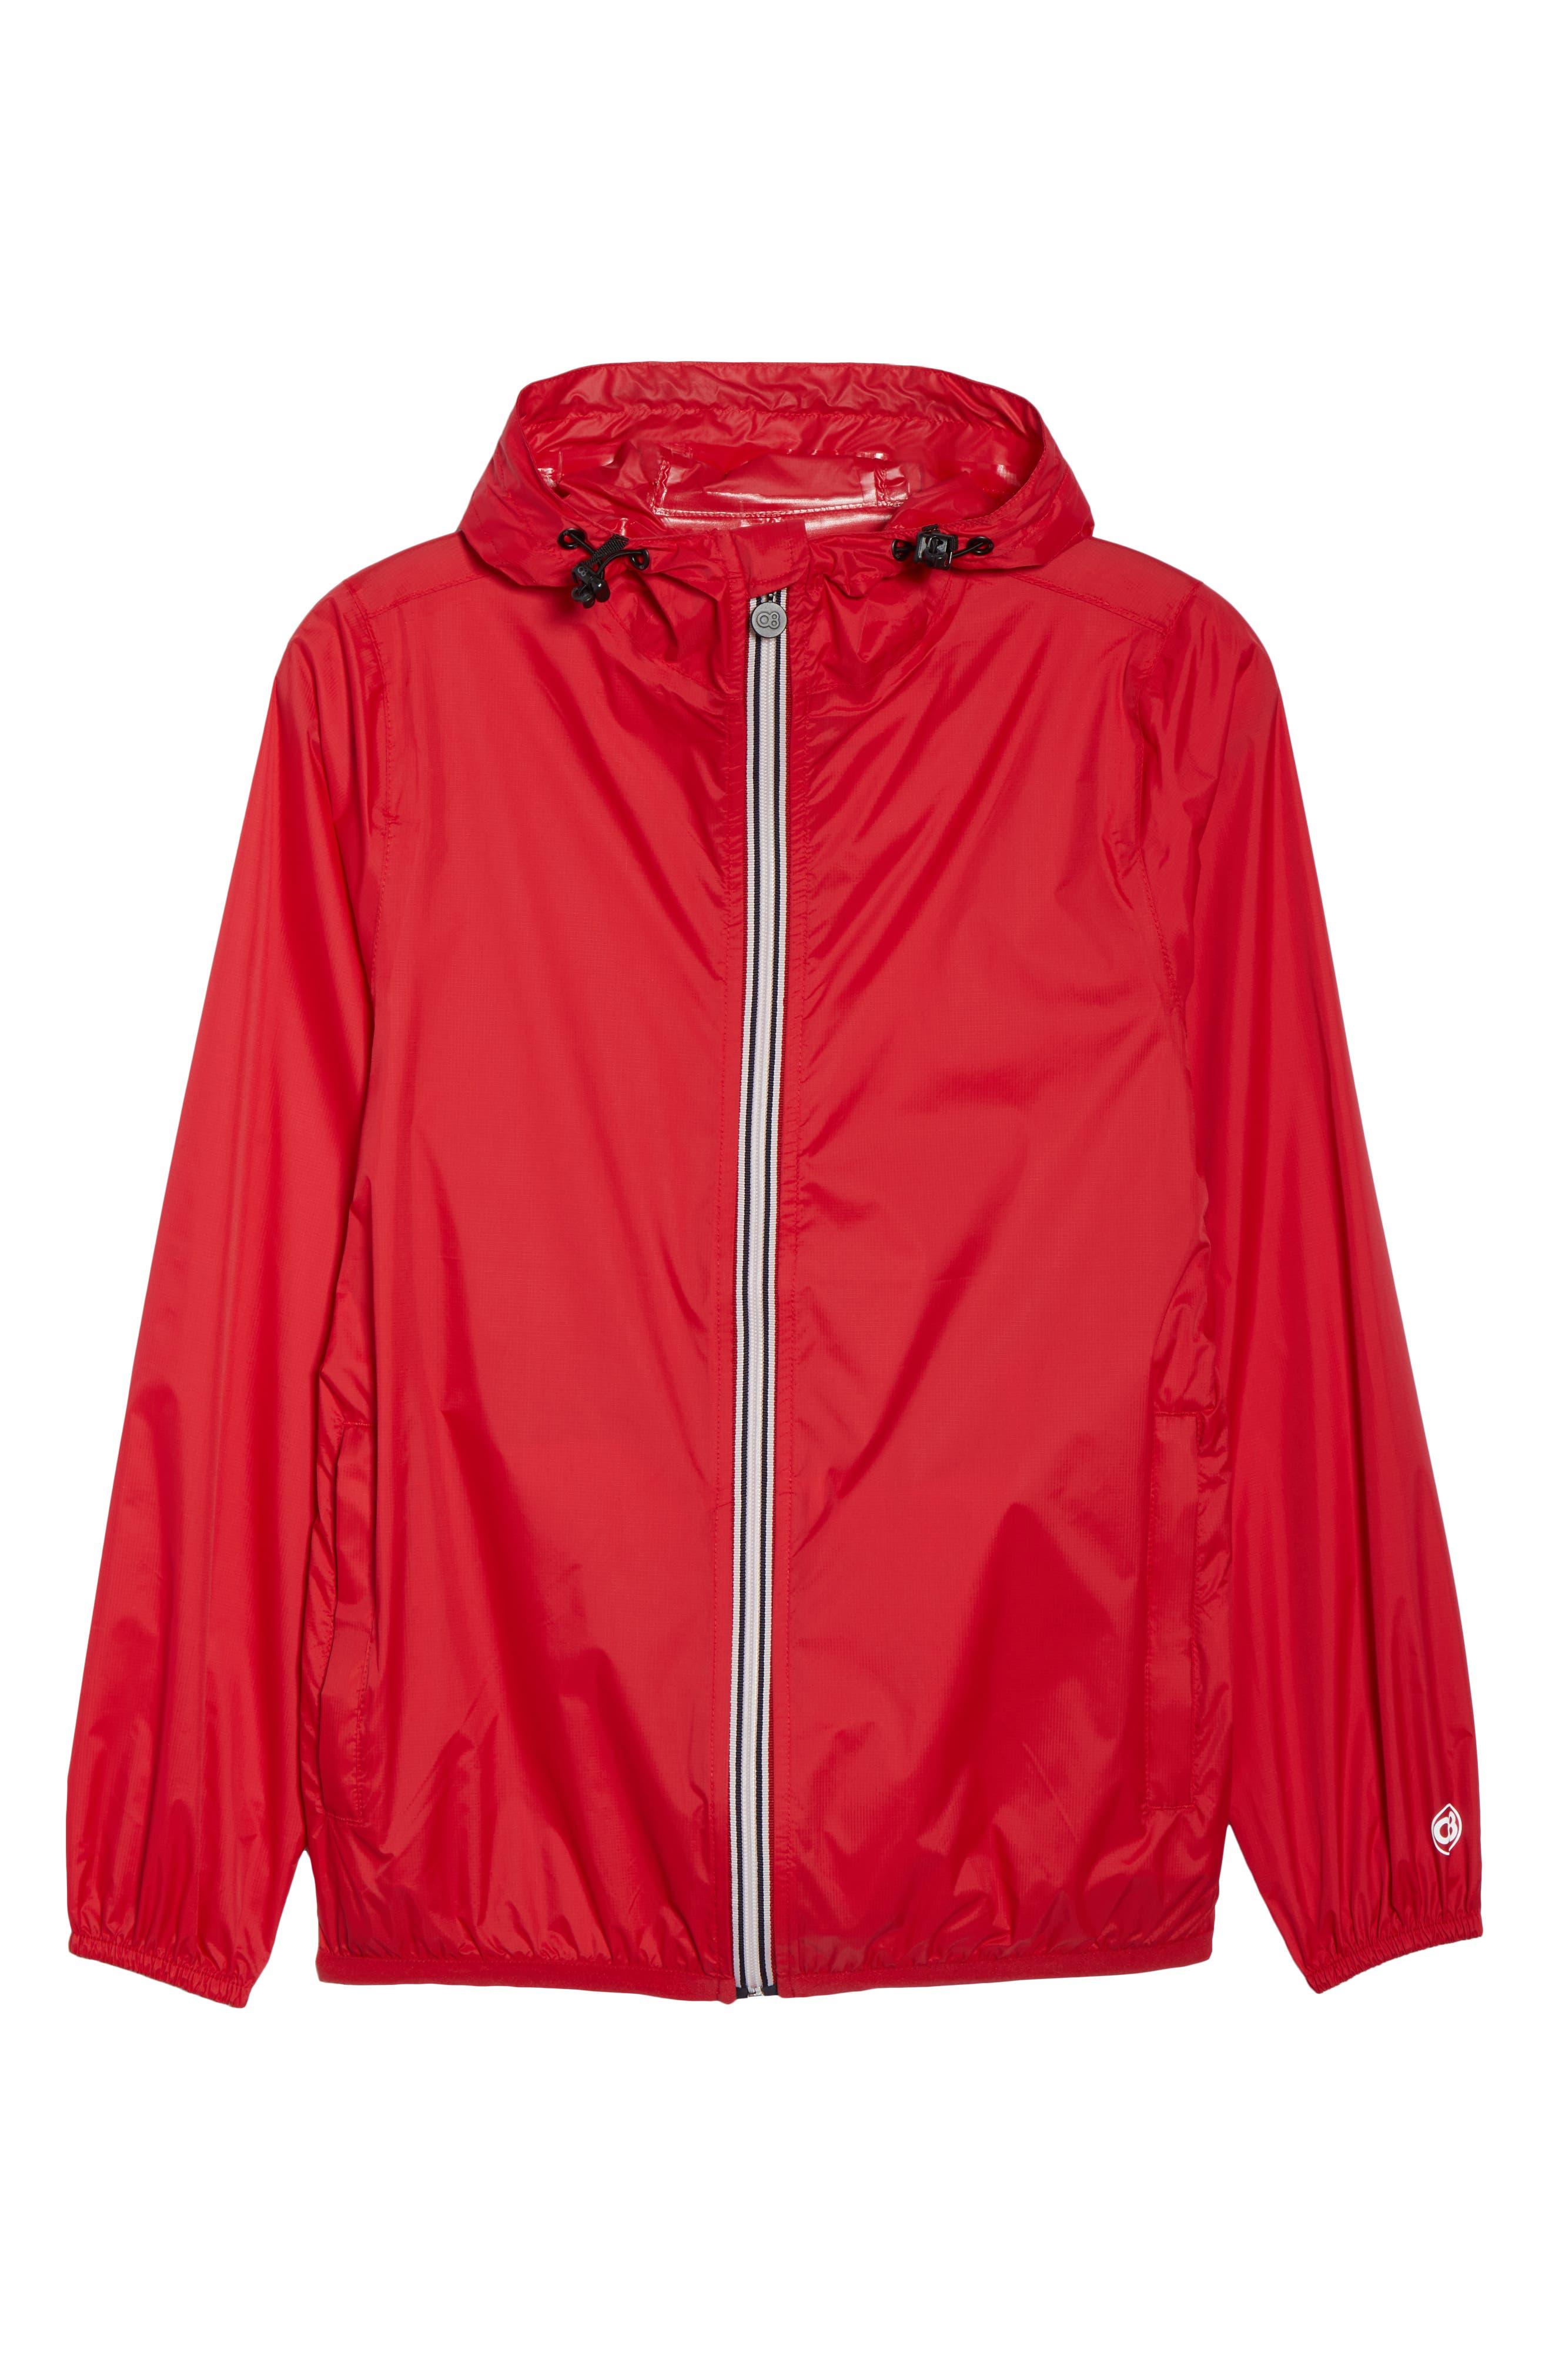 Packable Rain Jacket,                             Alternate thumbnail 8, color,                             Red